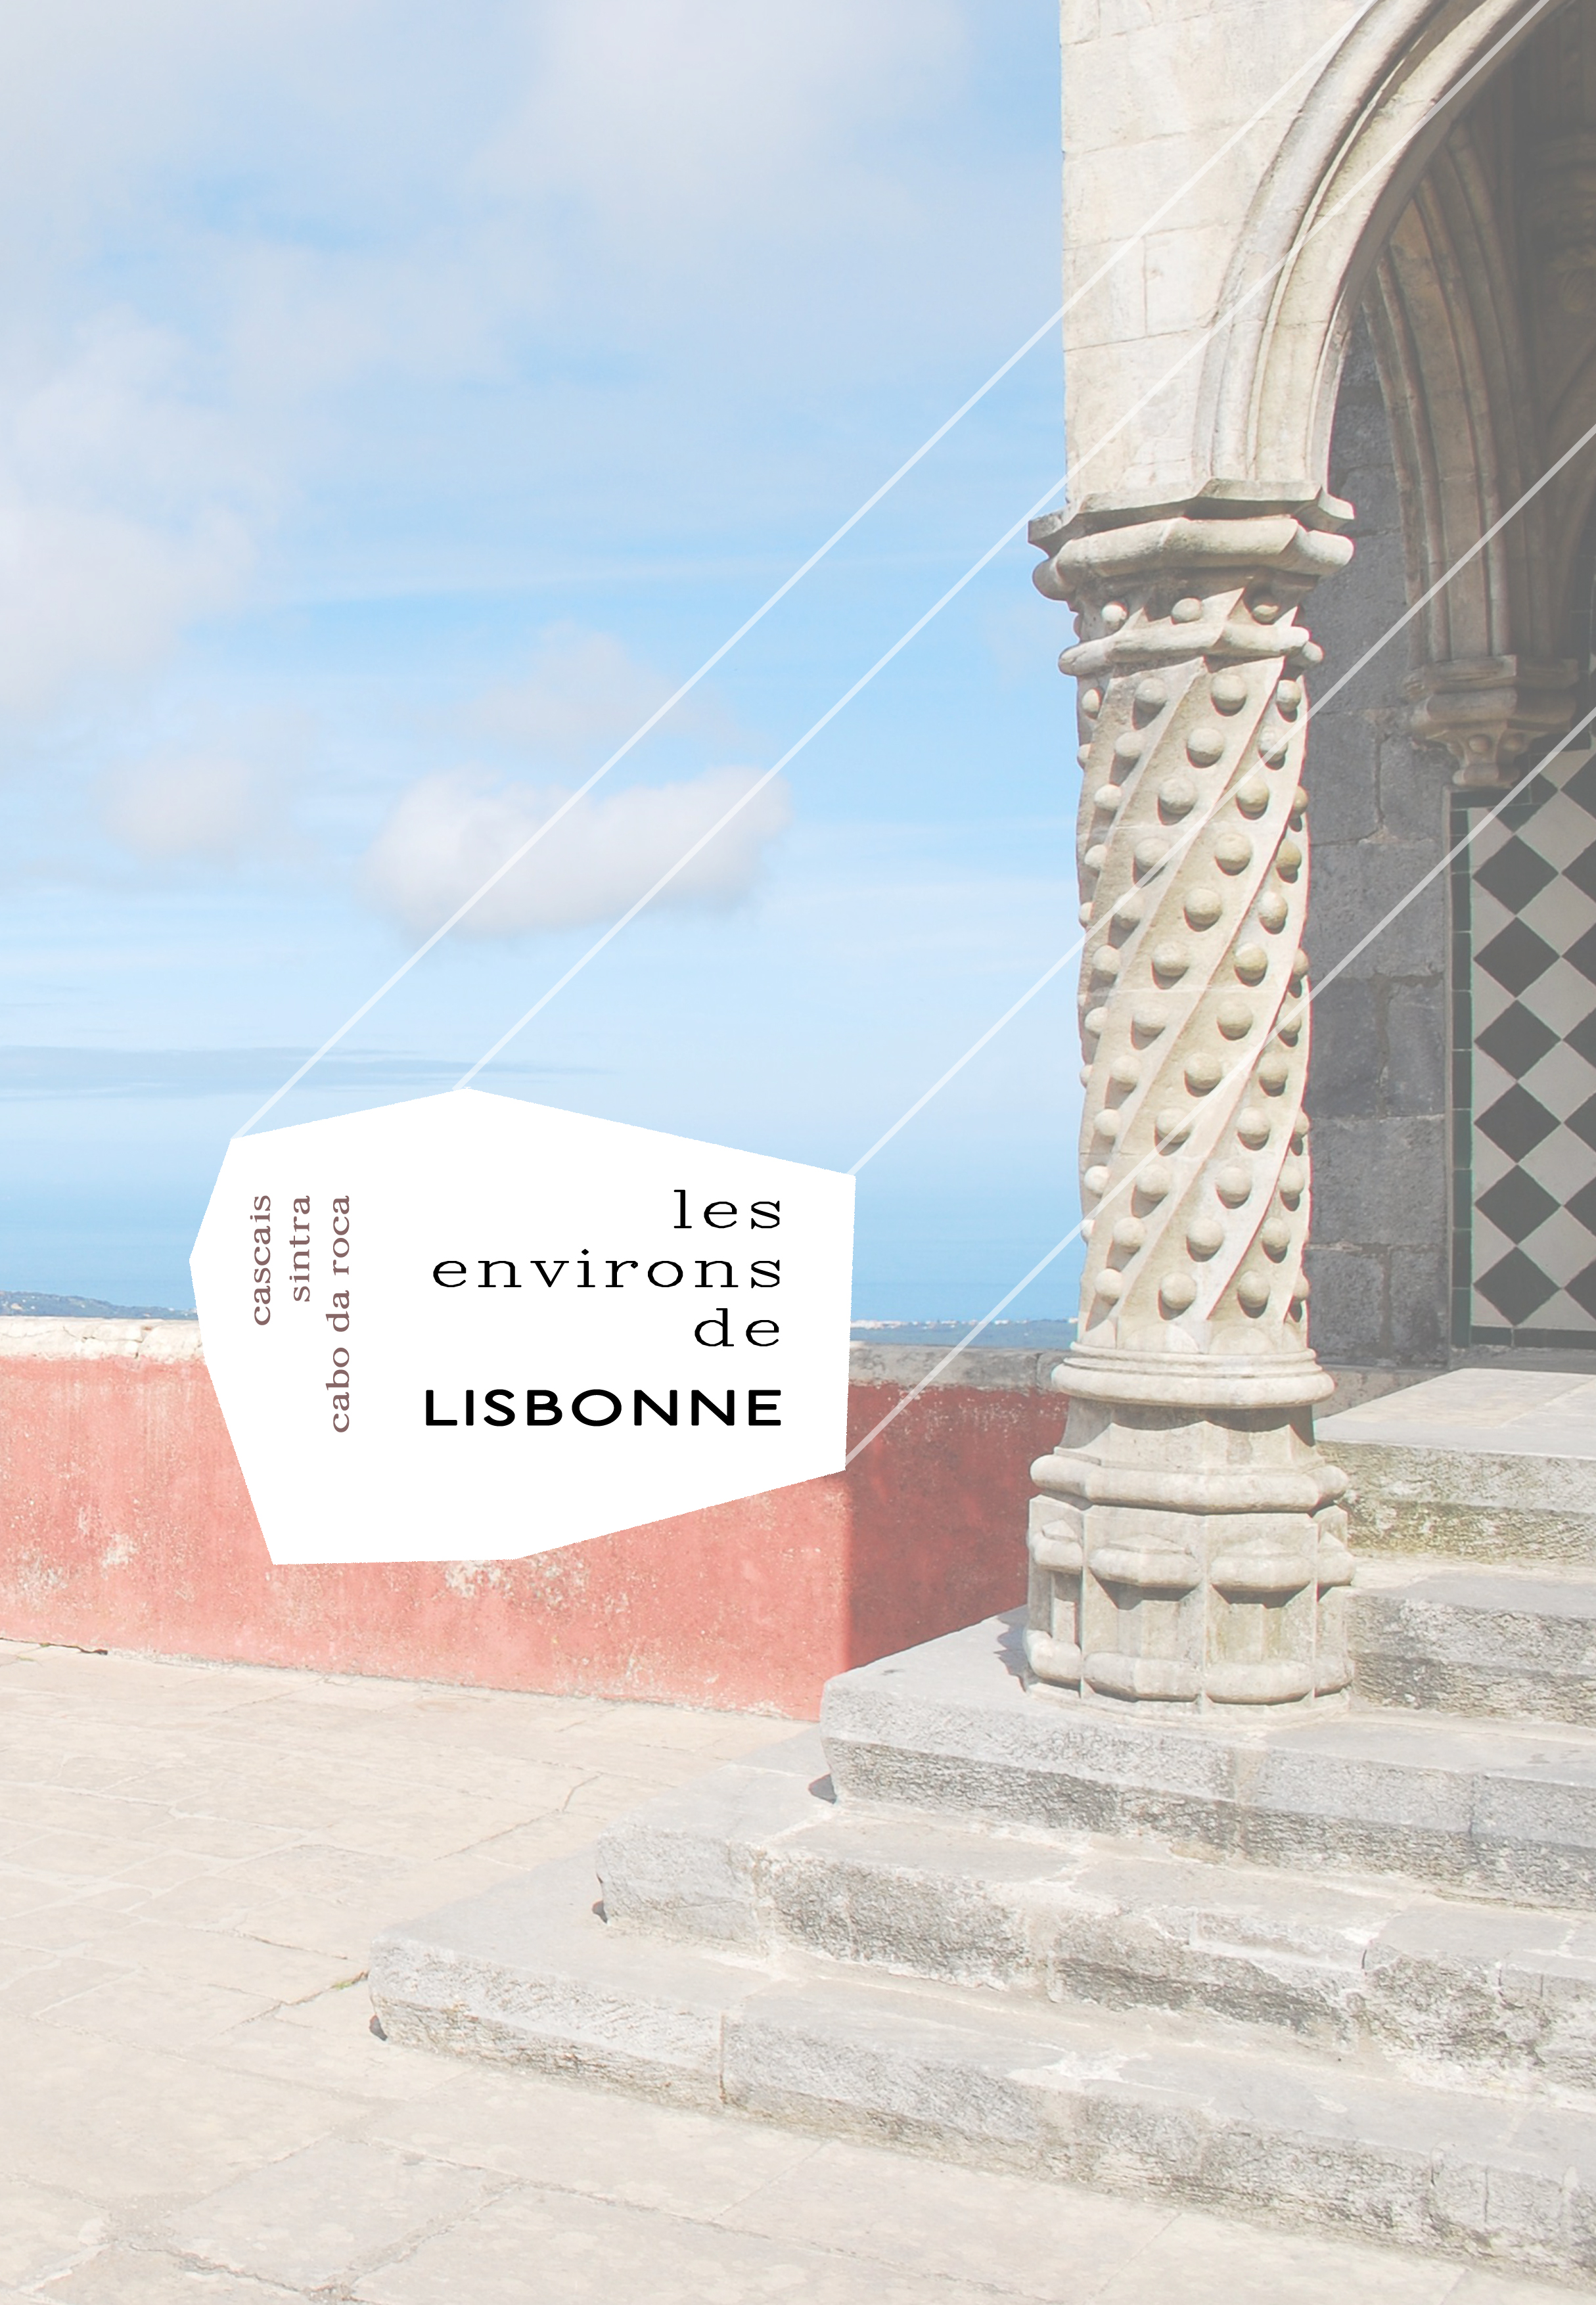 visuel-environ-lisbonne-sintra-portugal-by-le-polyedre